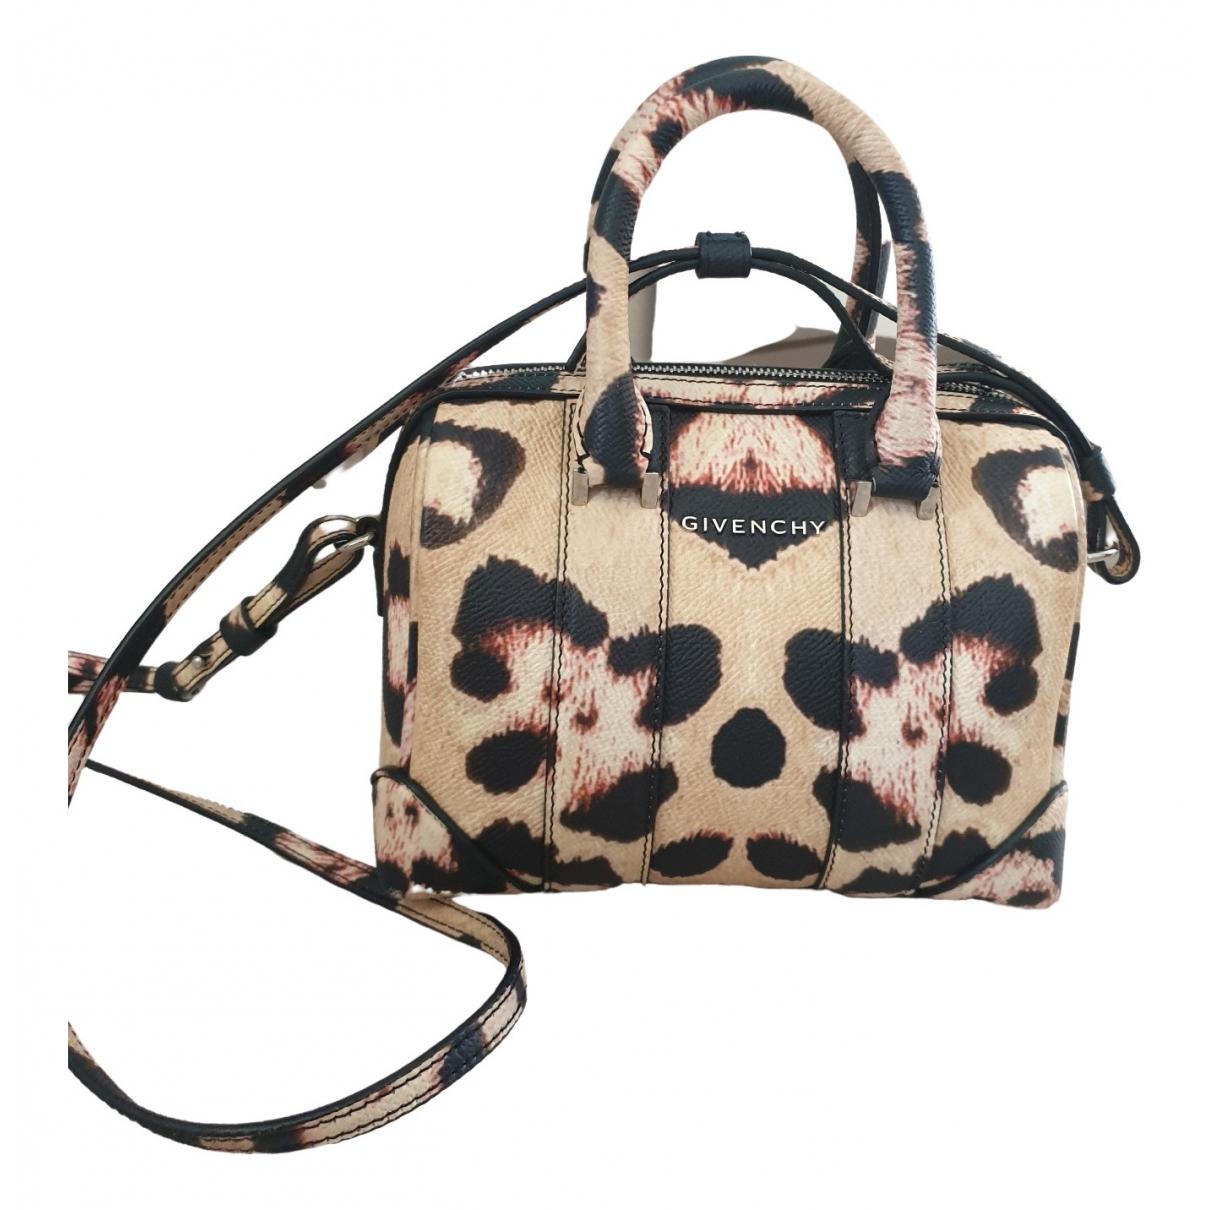 Givenchy Lucrezia Beige Leather handbag for Women \N